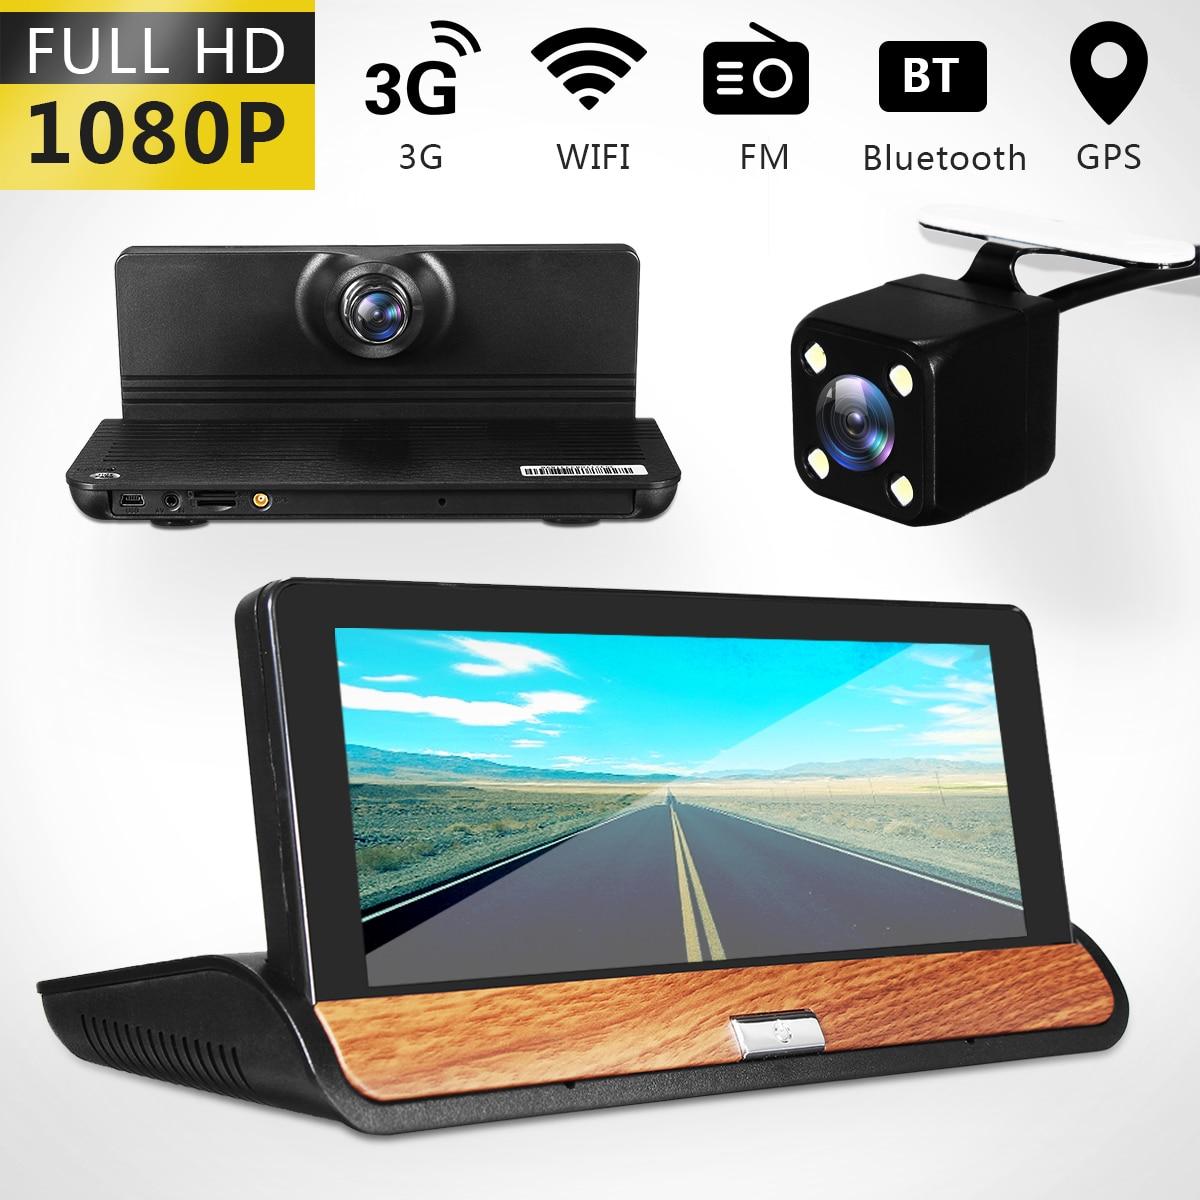 цена на 7inch Wifi Bluetooth Car DVR Rear View Mirror Monit Dual Lens HD 1080P Car Dashboard DVR Dash Camera Video Recorder G-Sensor GPS